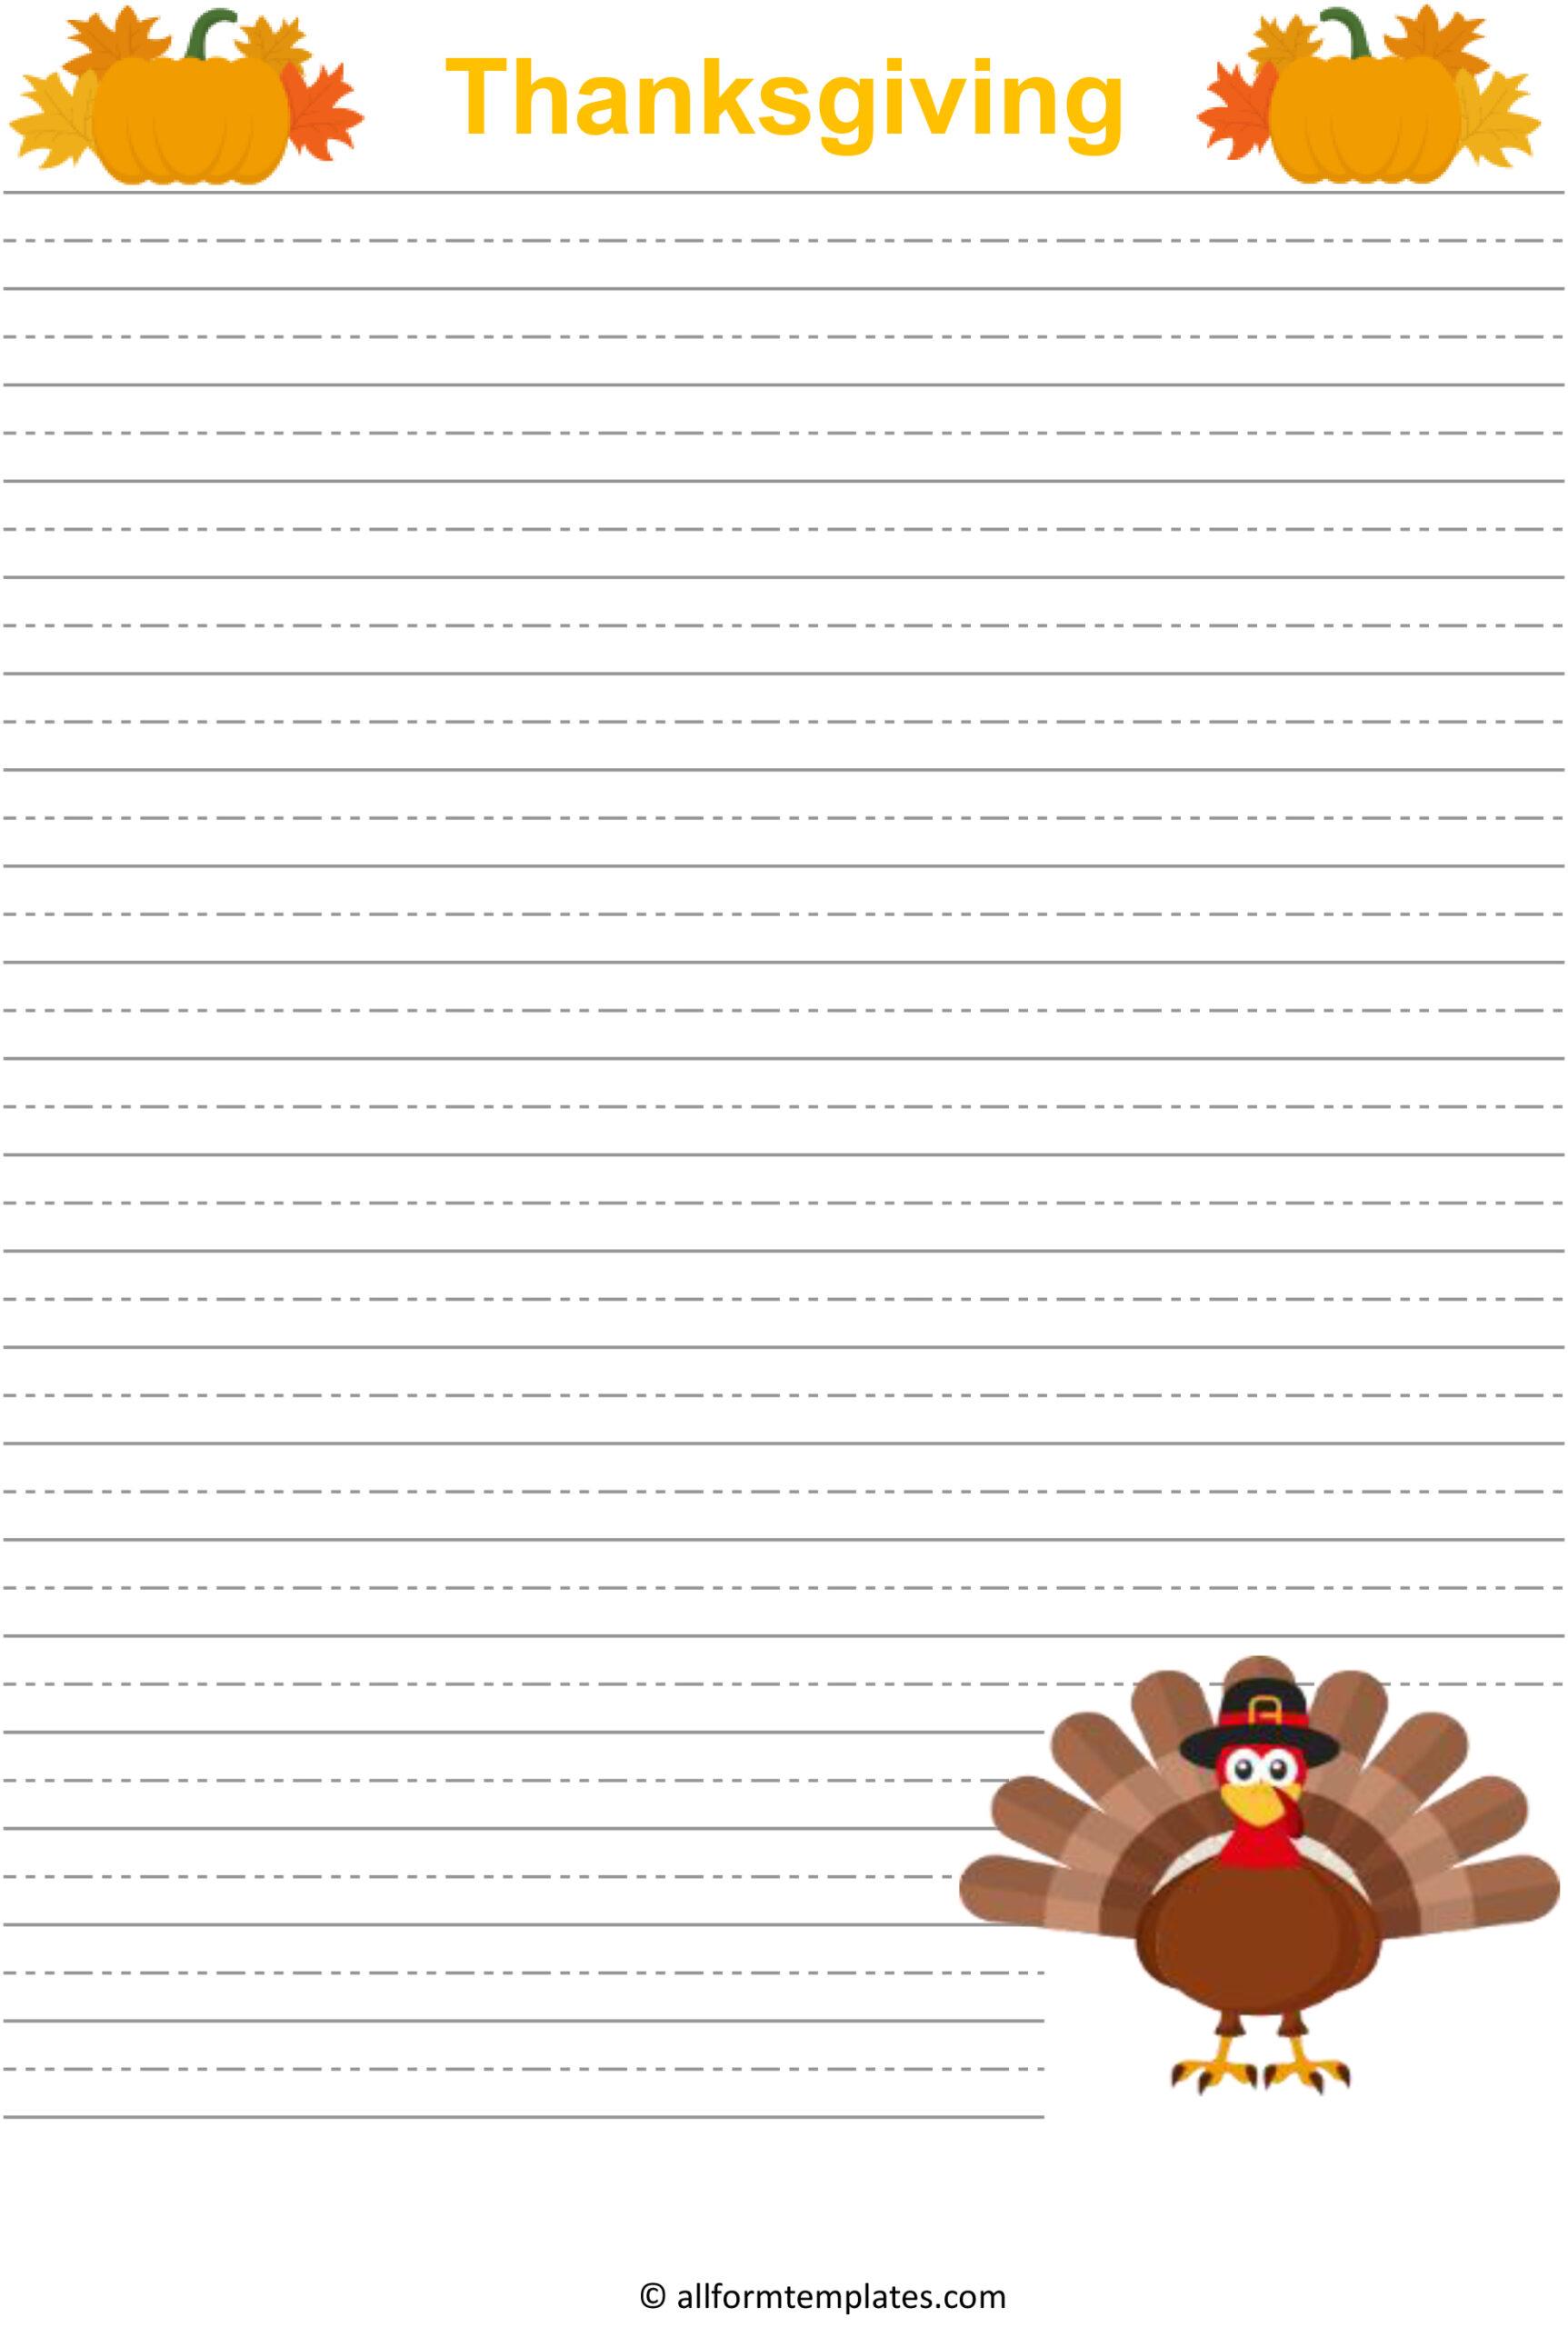 Thanksgiving-Line-Paper-HD